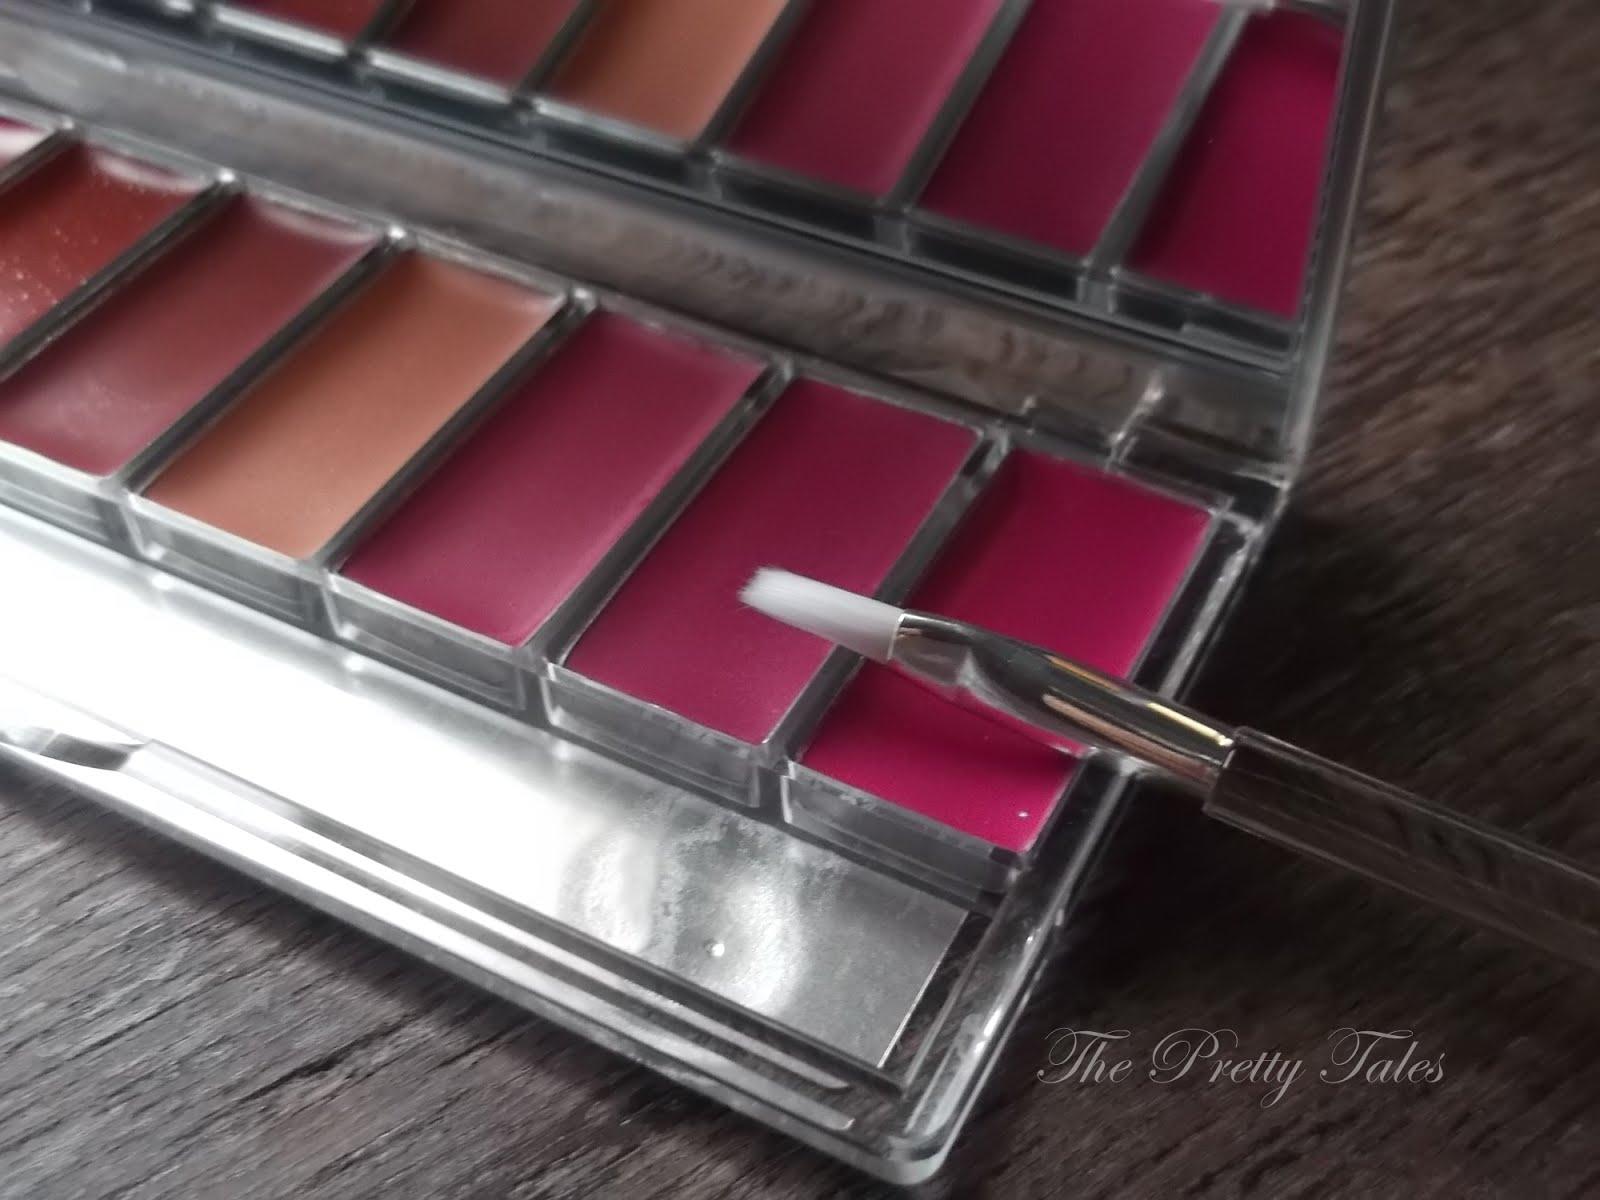 Harga Dan Spek Wardah Lip Palette Terbaru 2018 Pinky Peach Review The Pretty Tales